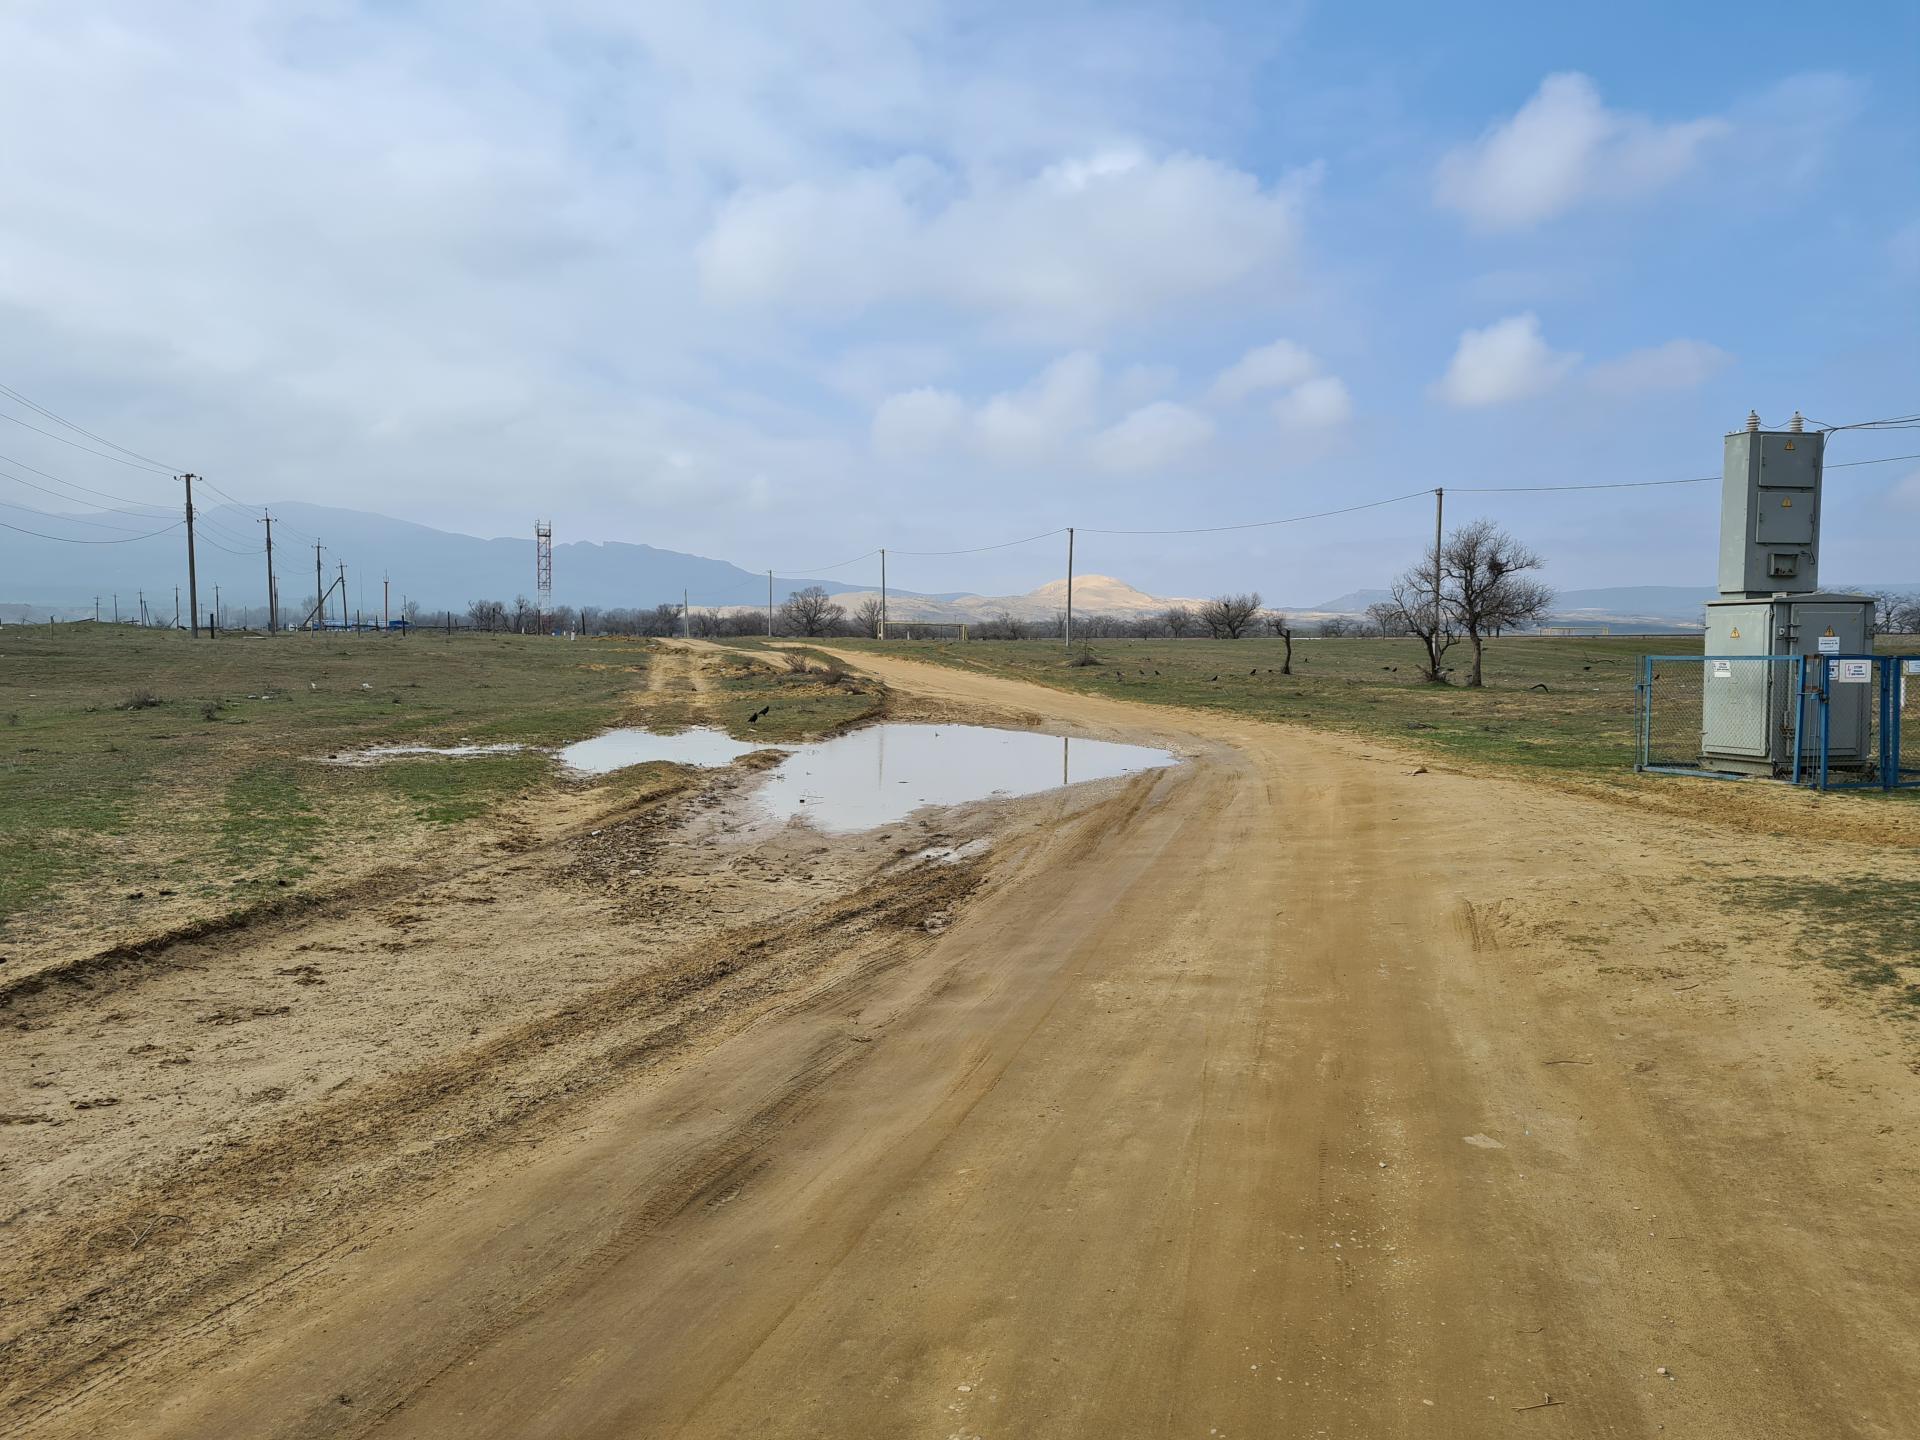 грунтовая дорога на бархан Сарыкум